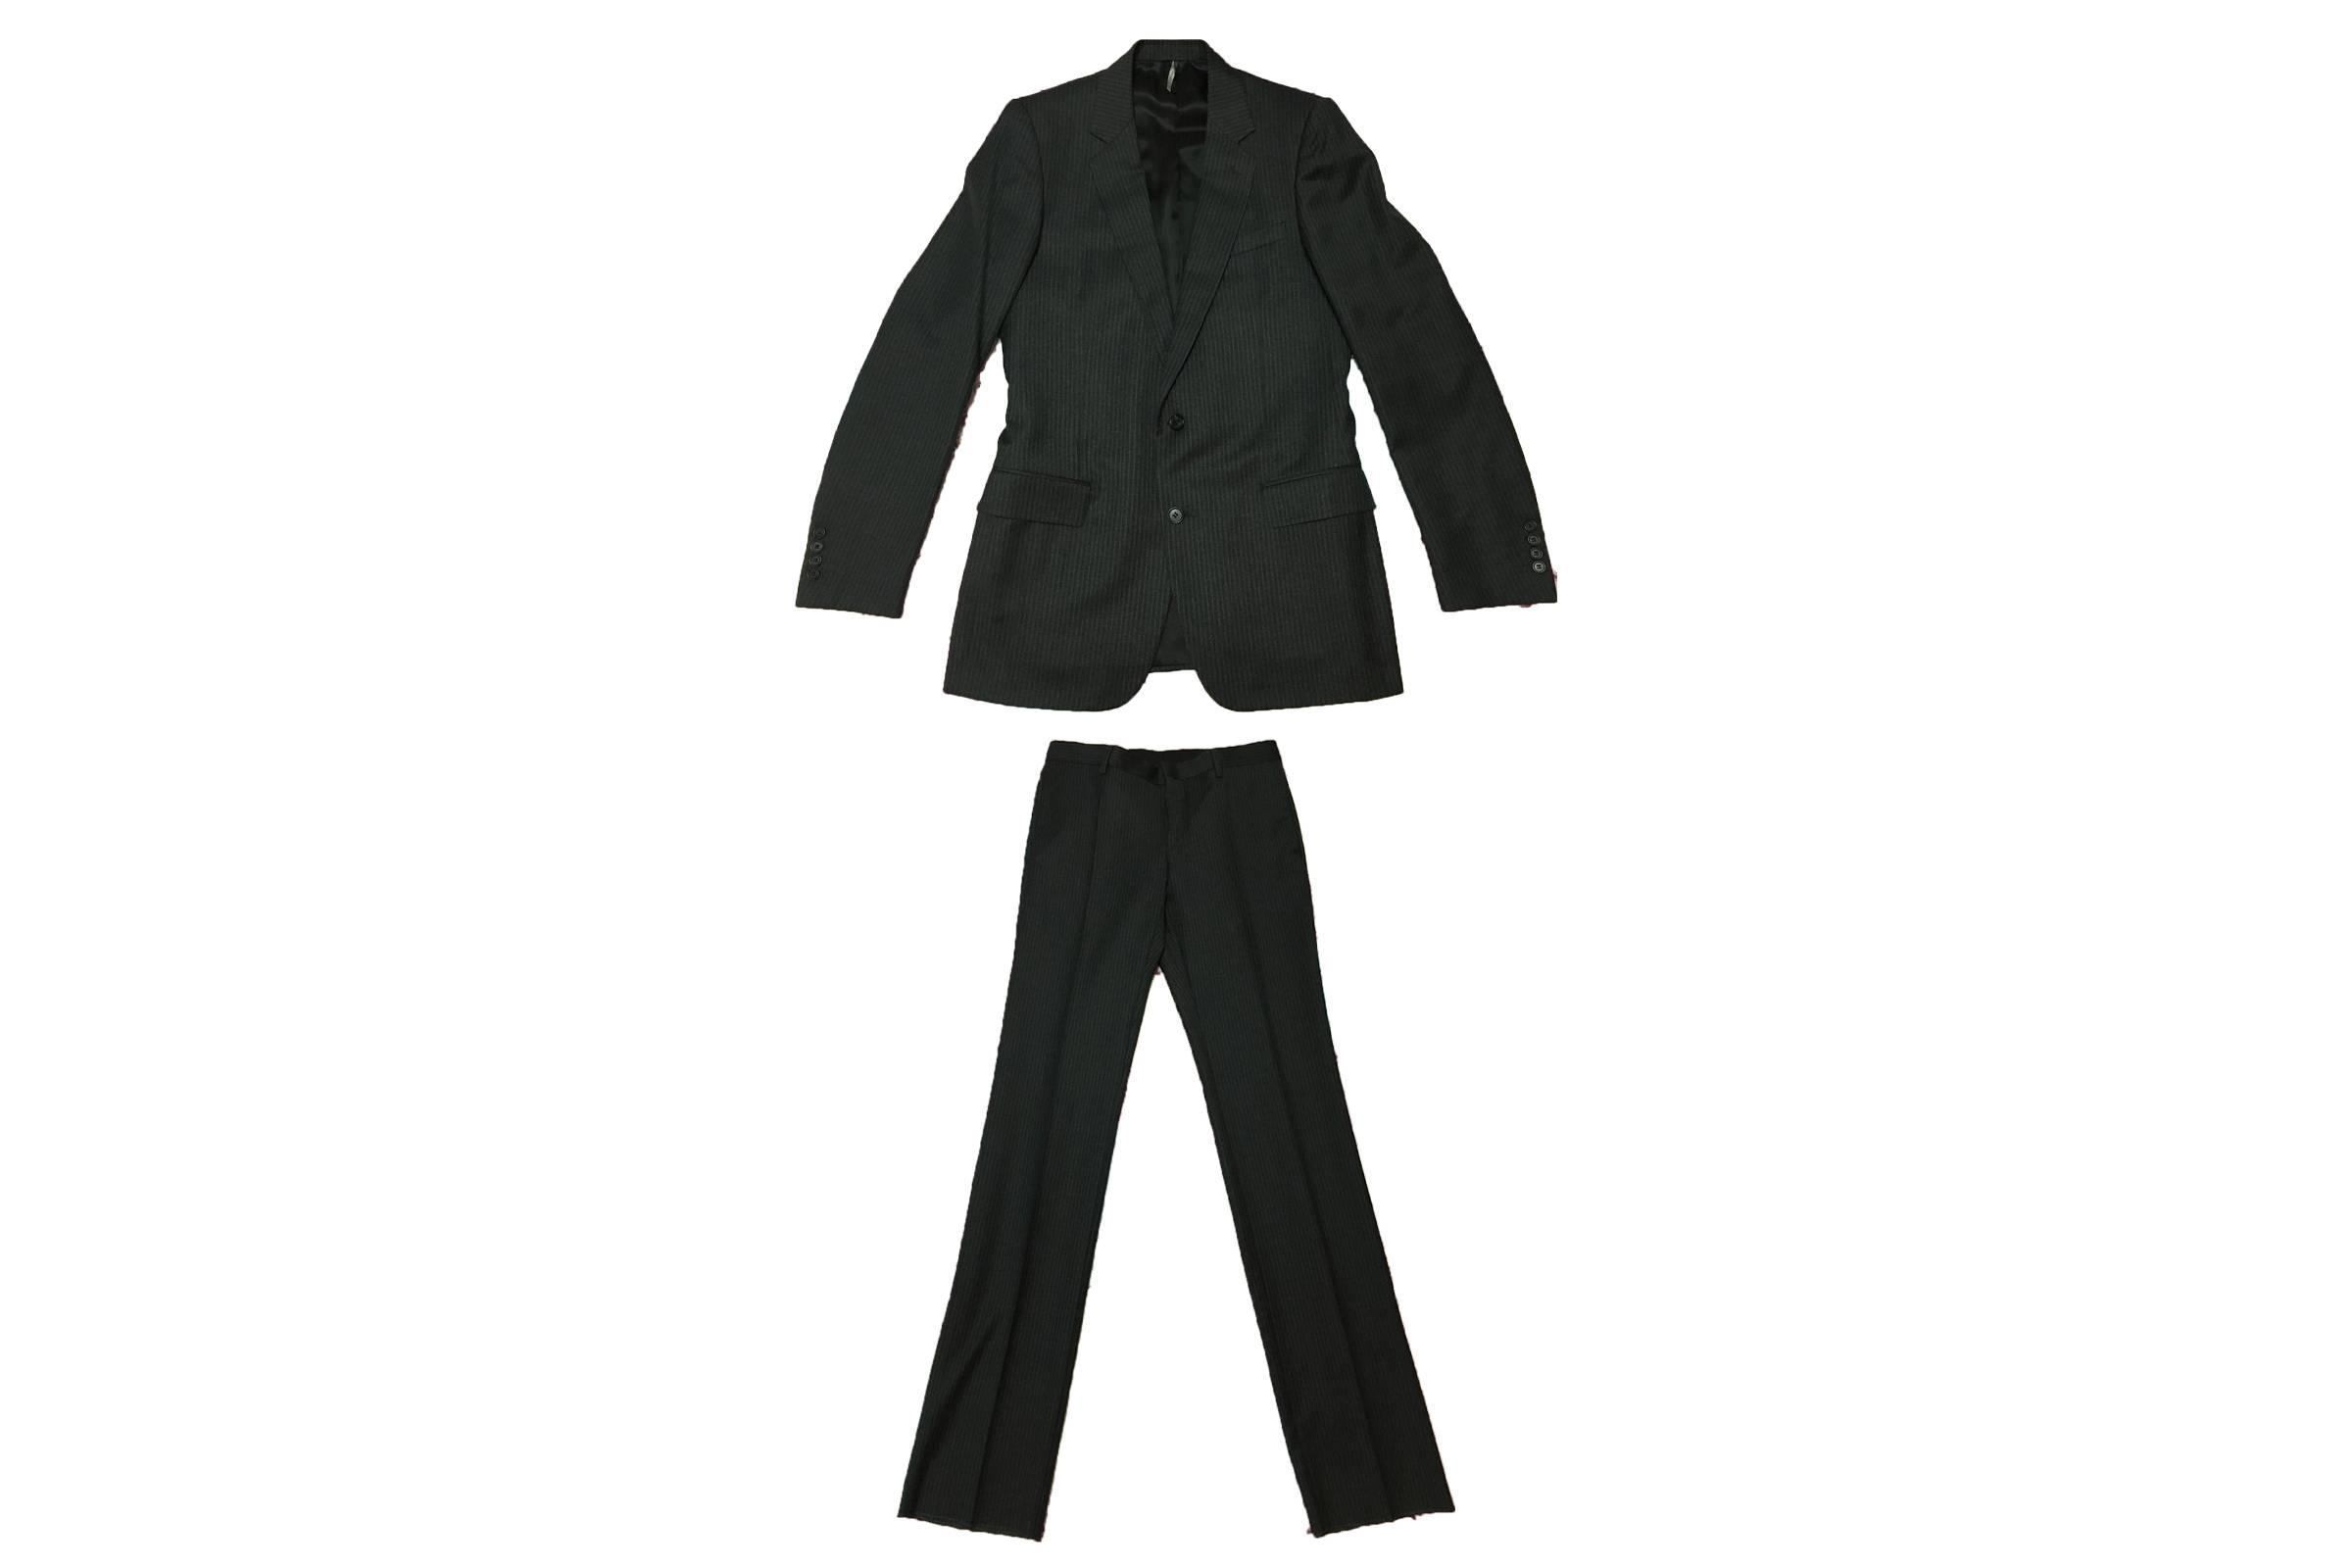 Dior Homme Pinestripe Suit